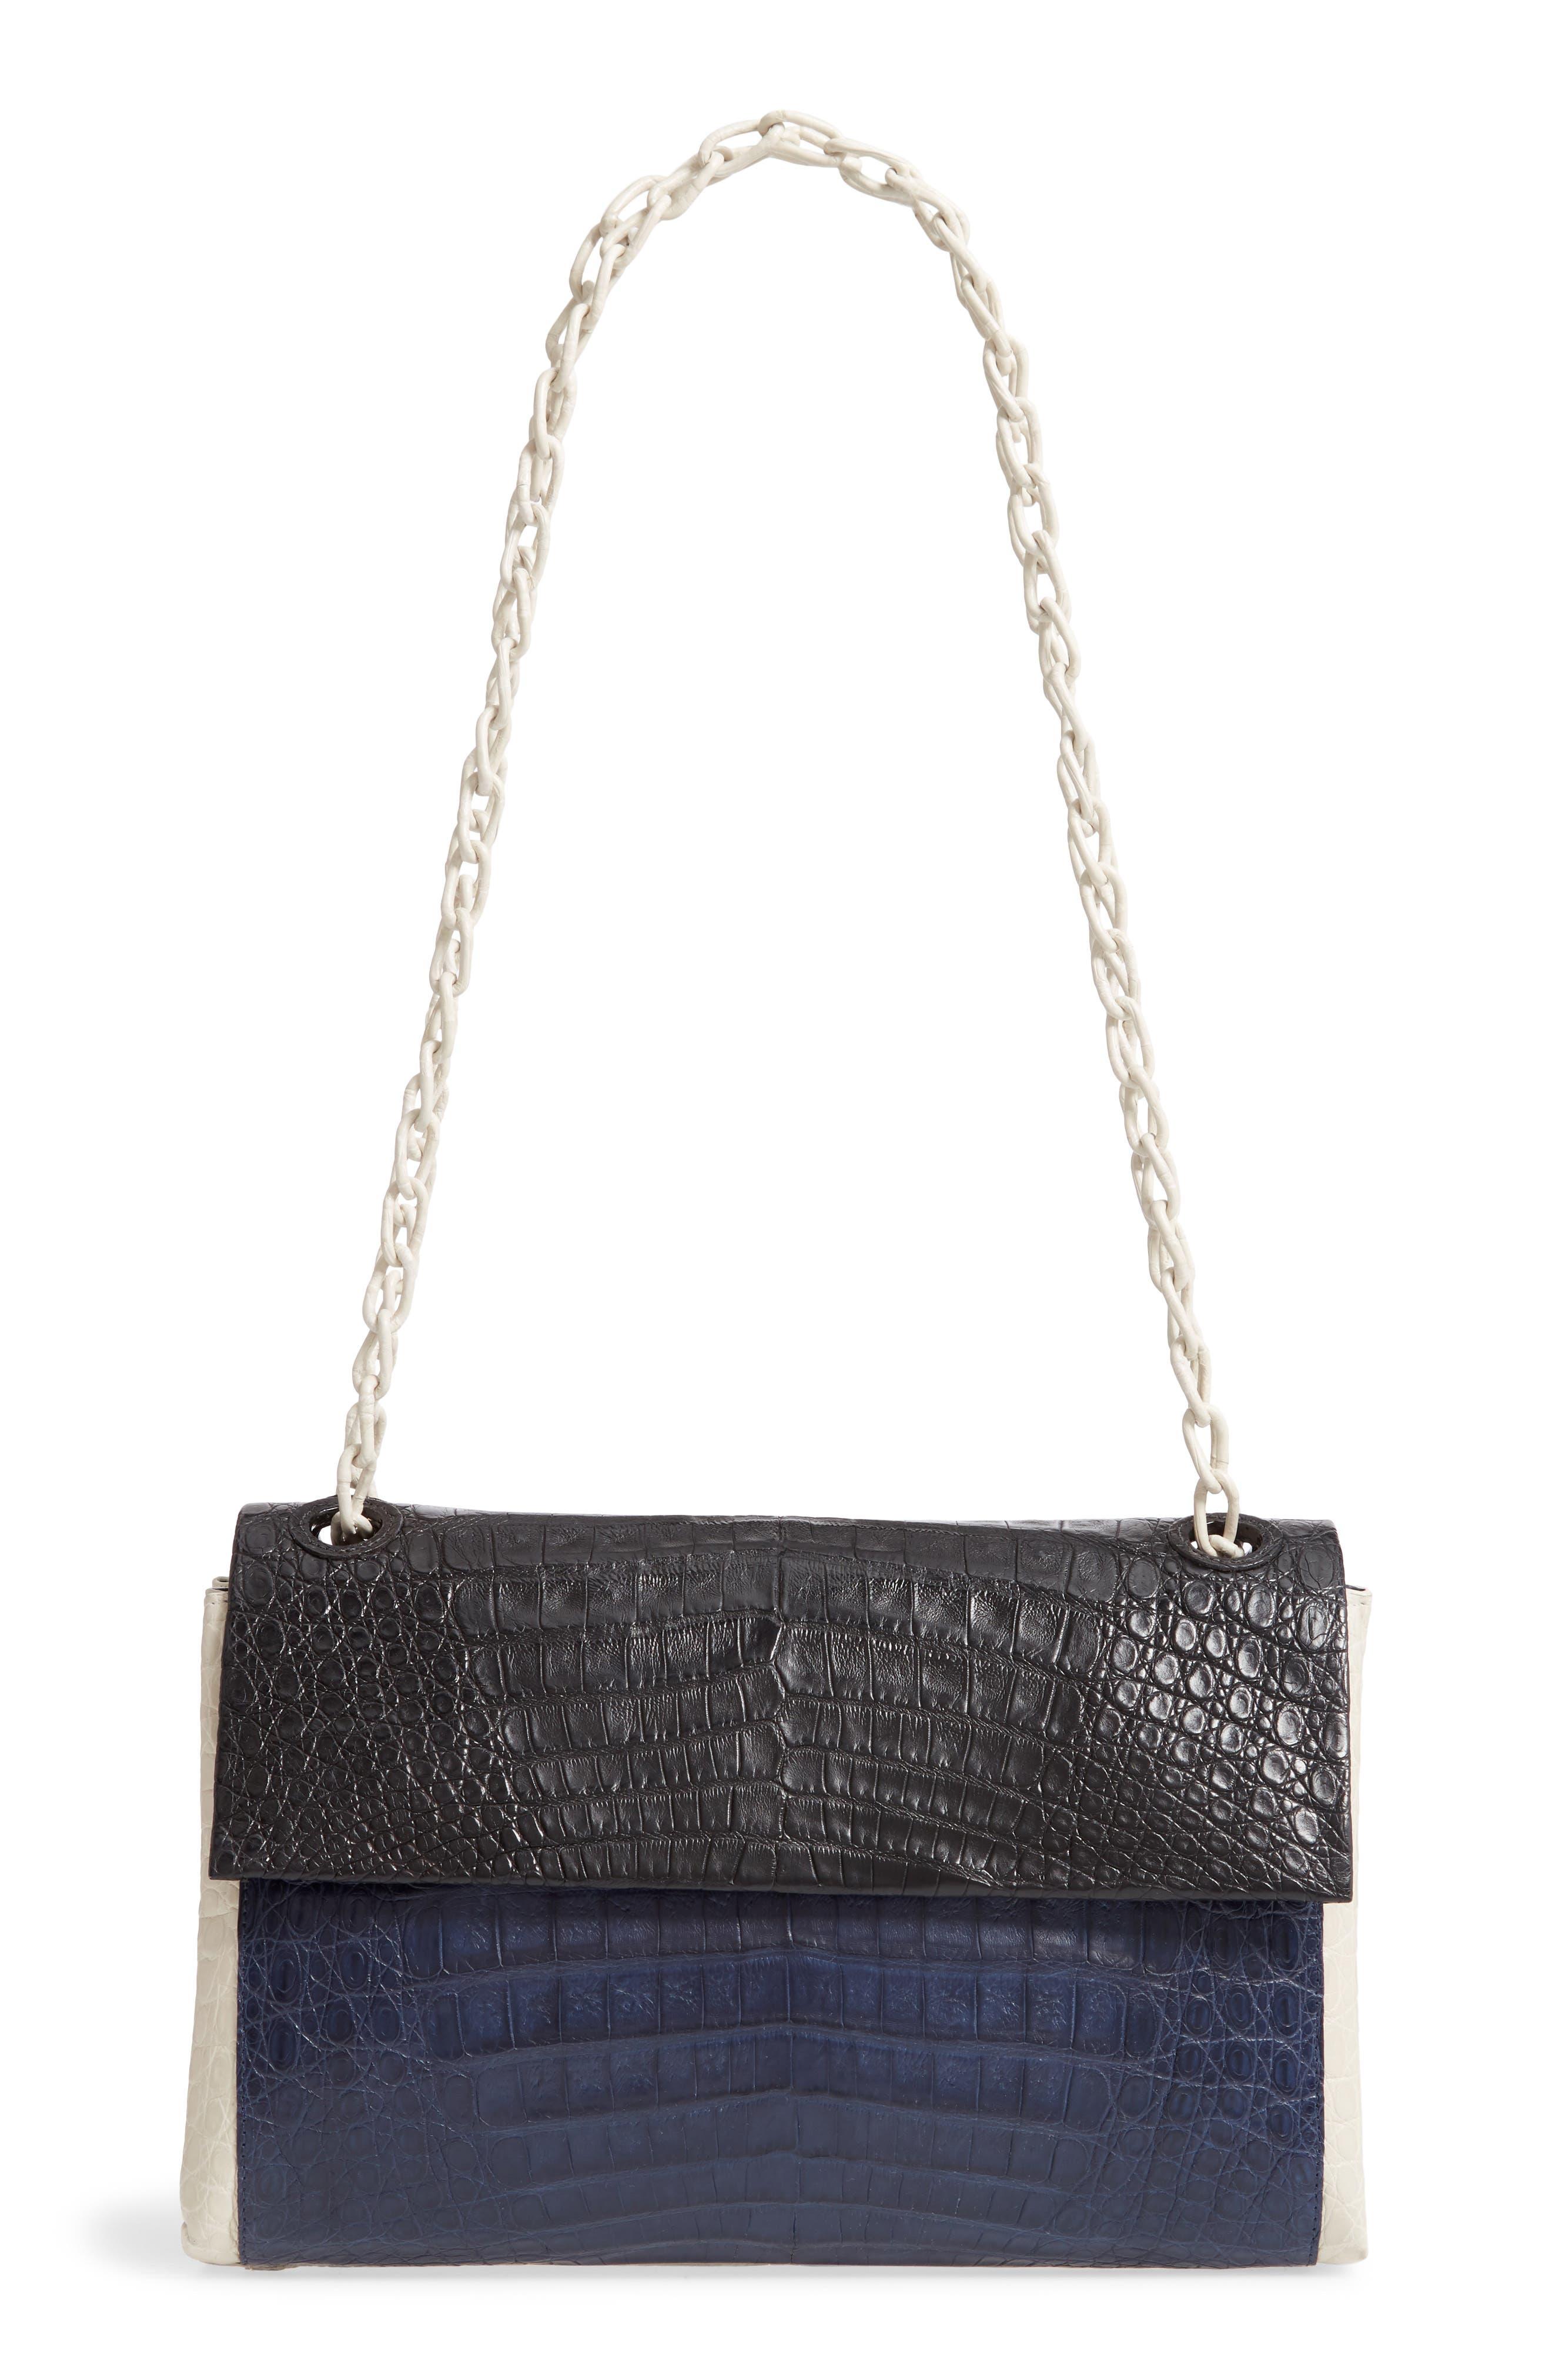 NANCY GONZALEZ Medium Madison Genuine Crocodile Shoulder Bag, Main, color, BLACK / NAVY/ LIGHT GREY